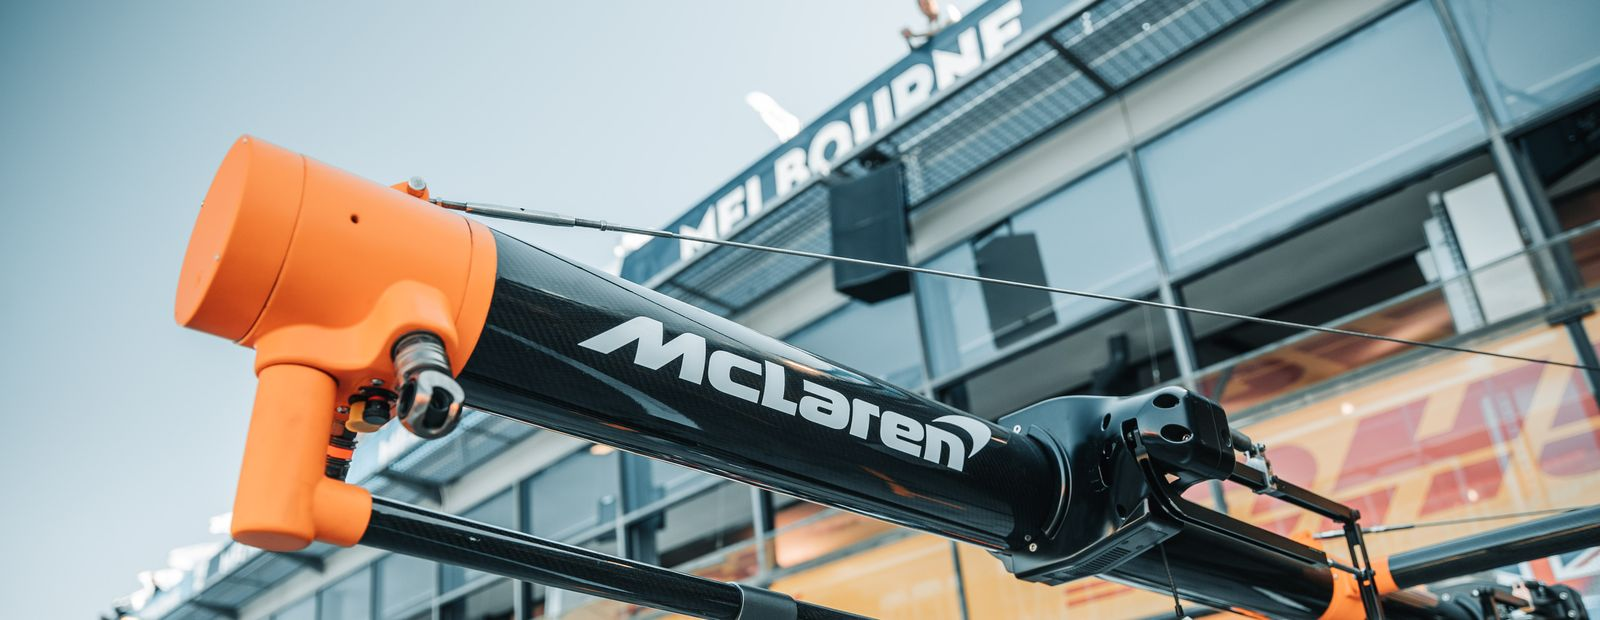 Message from McLaren